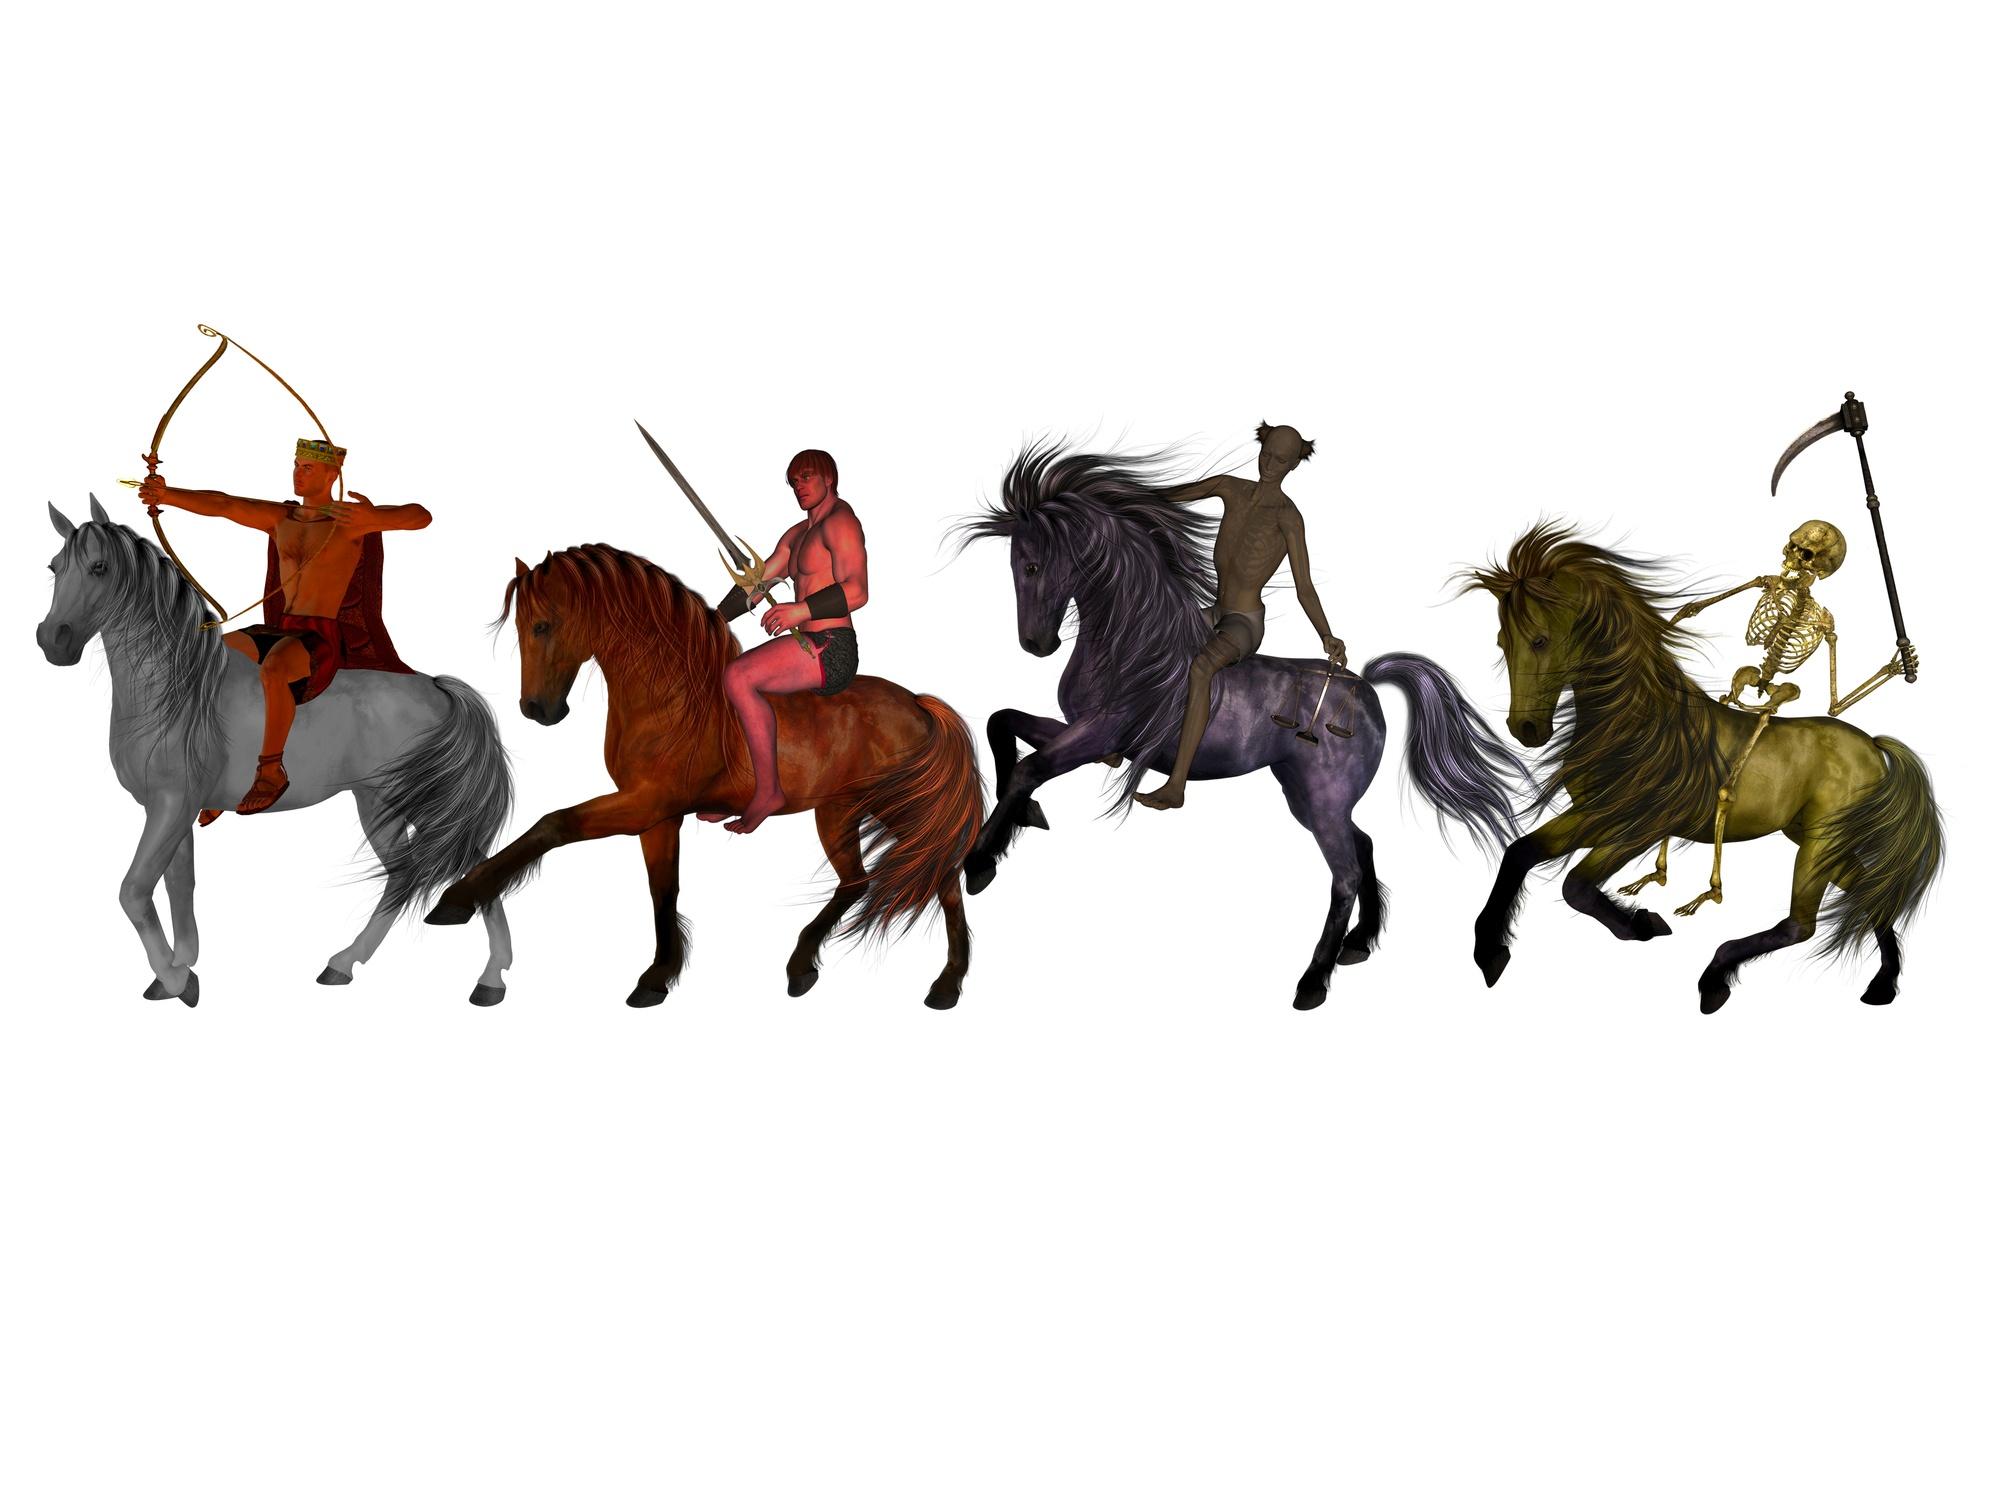 four-horsemen-project-management-risks.jpg